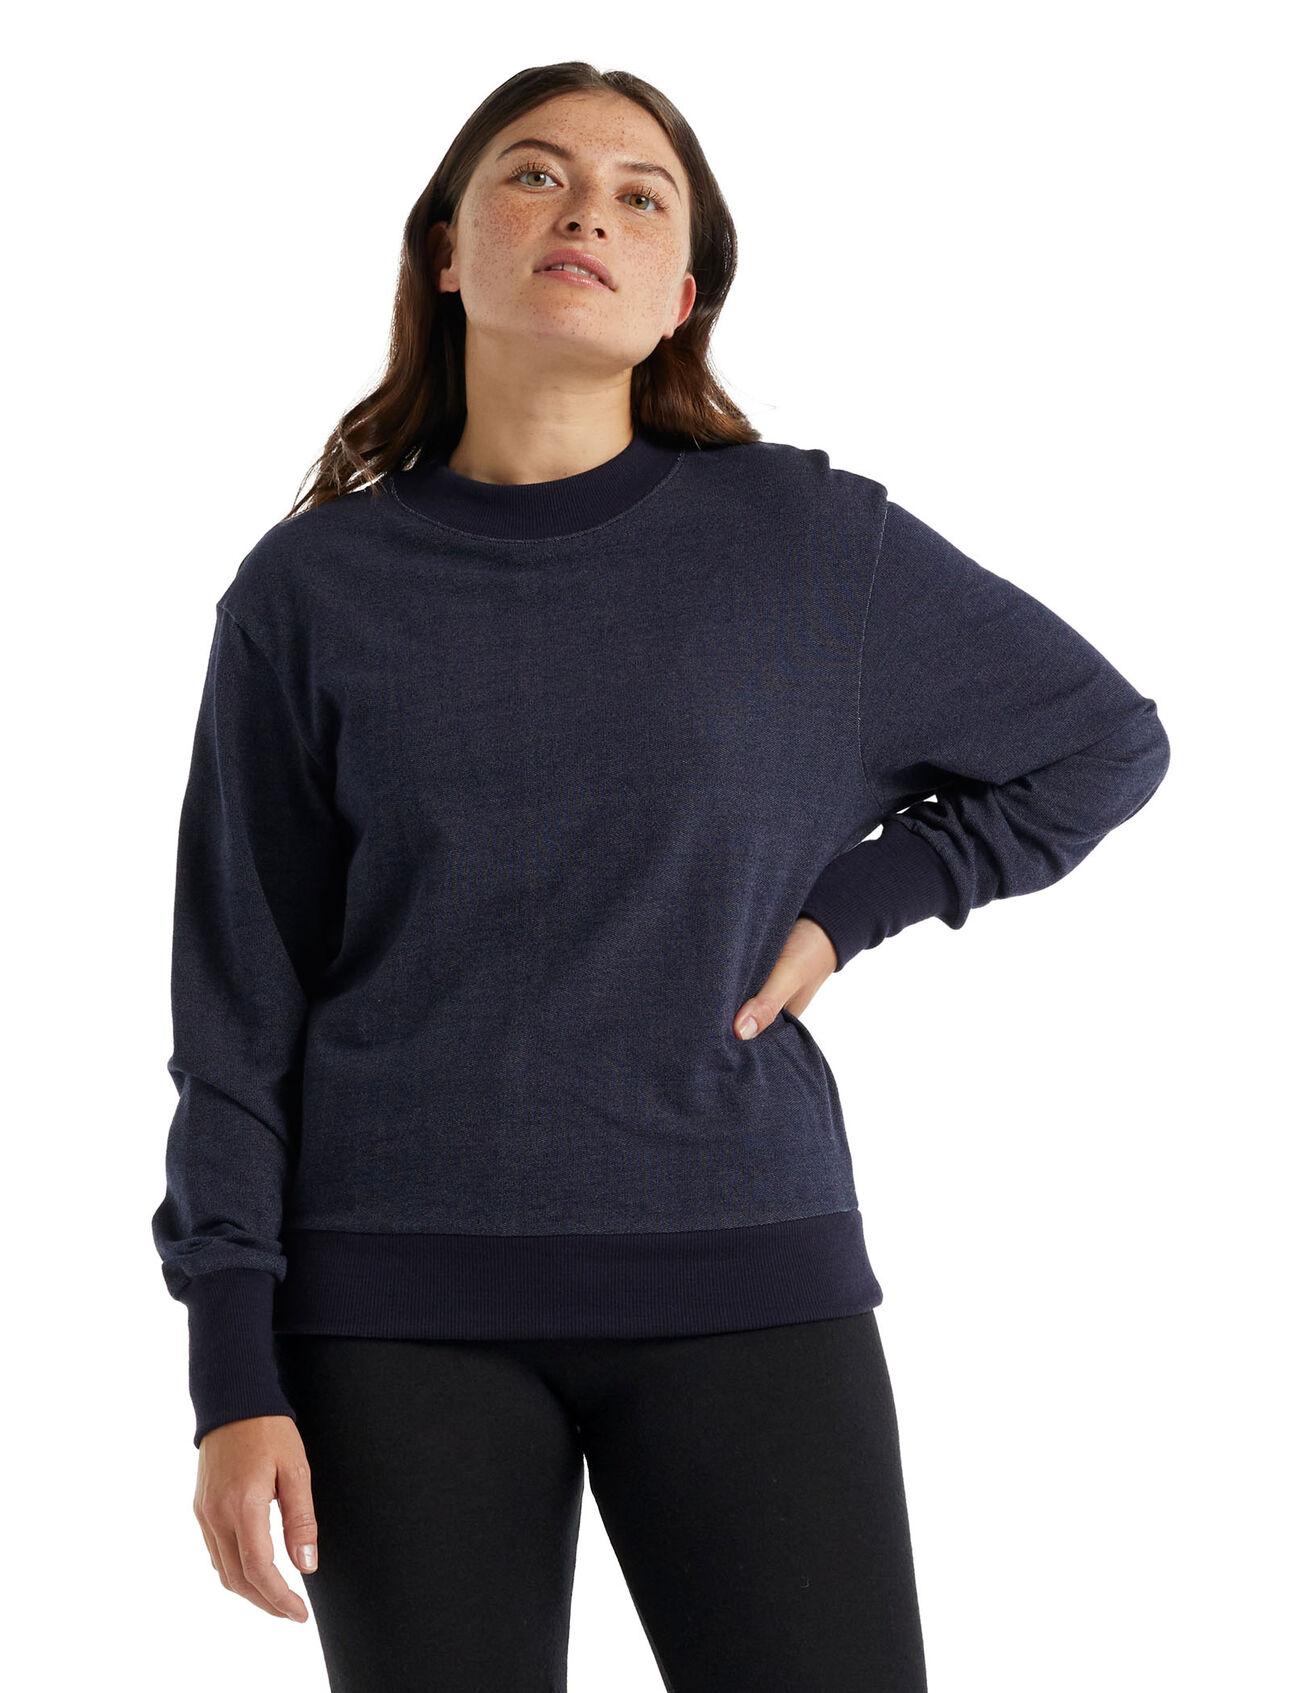 美丽诺羊毛Central长袖运动衫